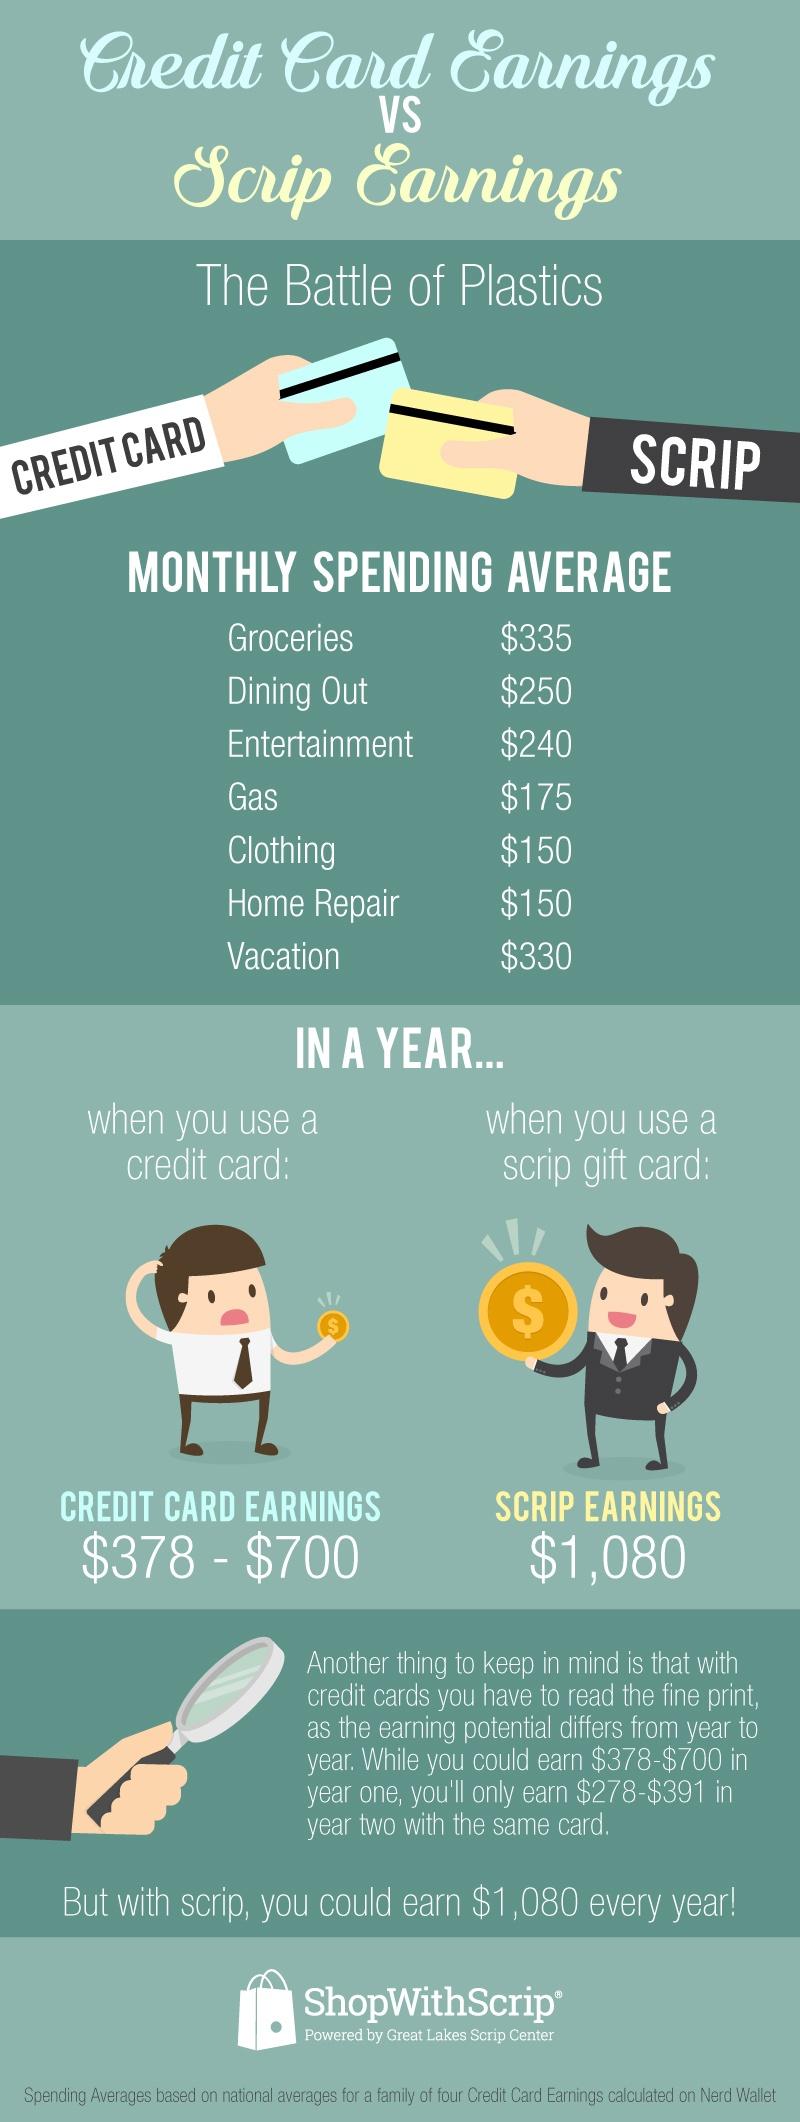 Credit_Card_vs_Scrip_Infographic